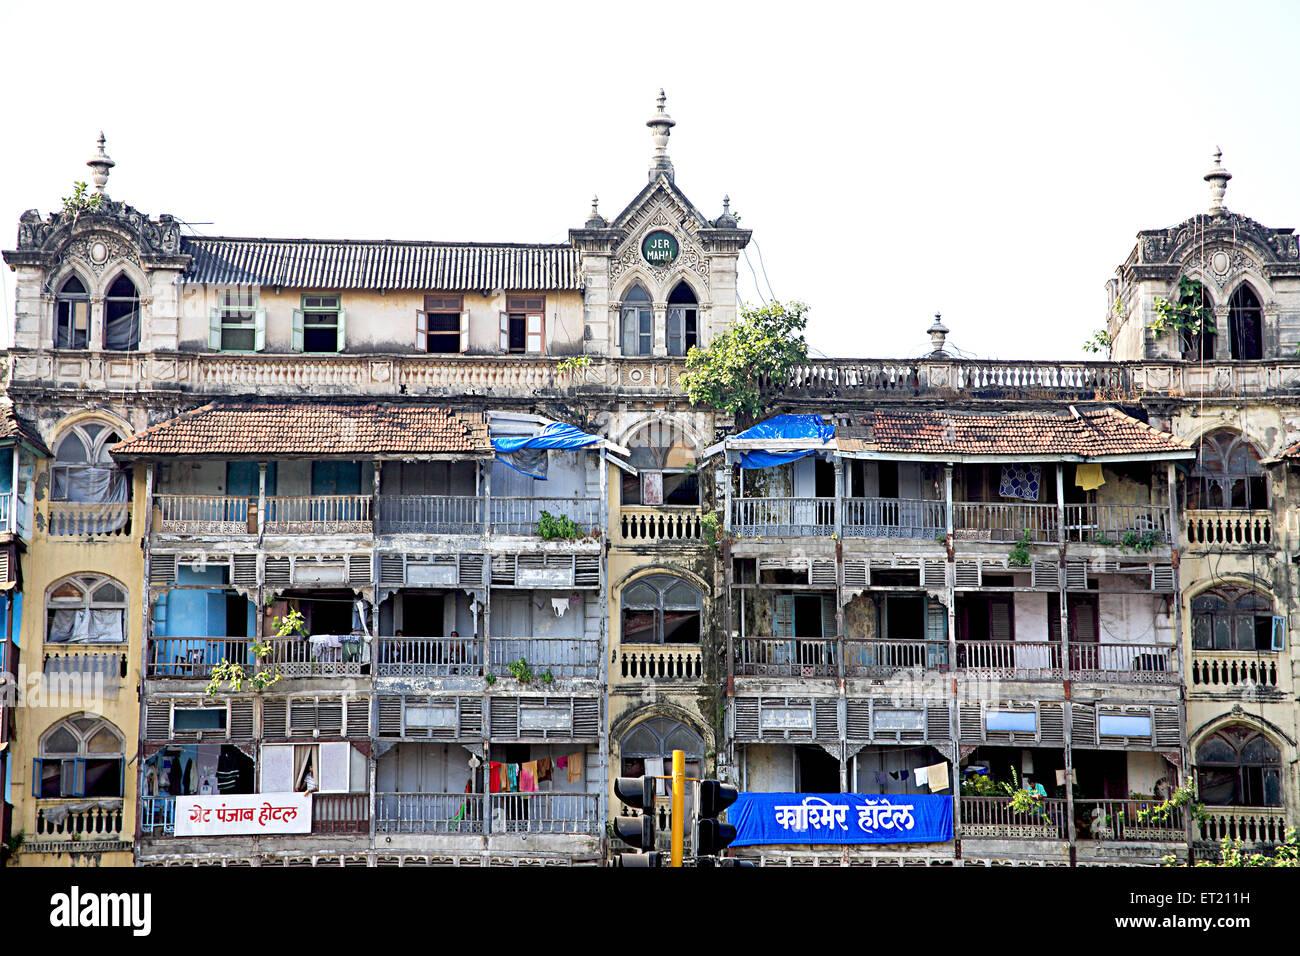 Old building Jer Mahal mass urban housing